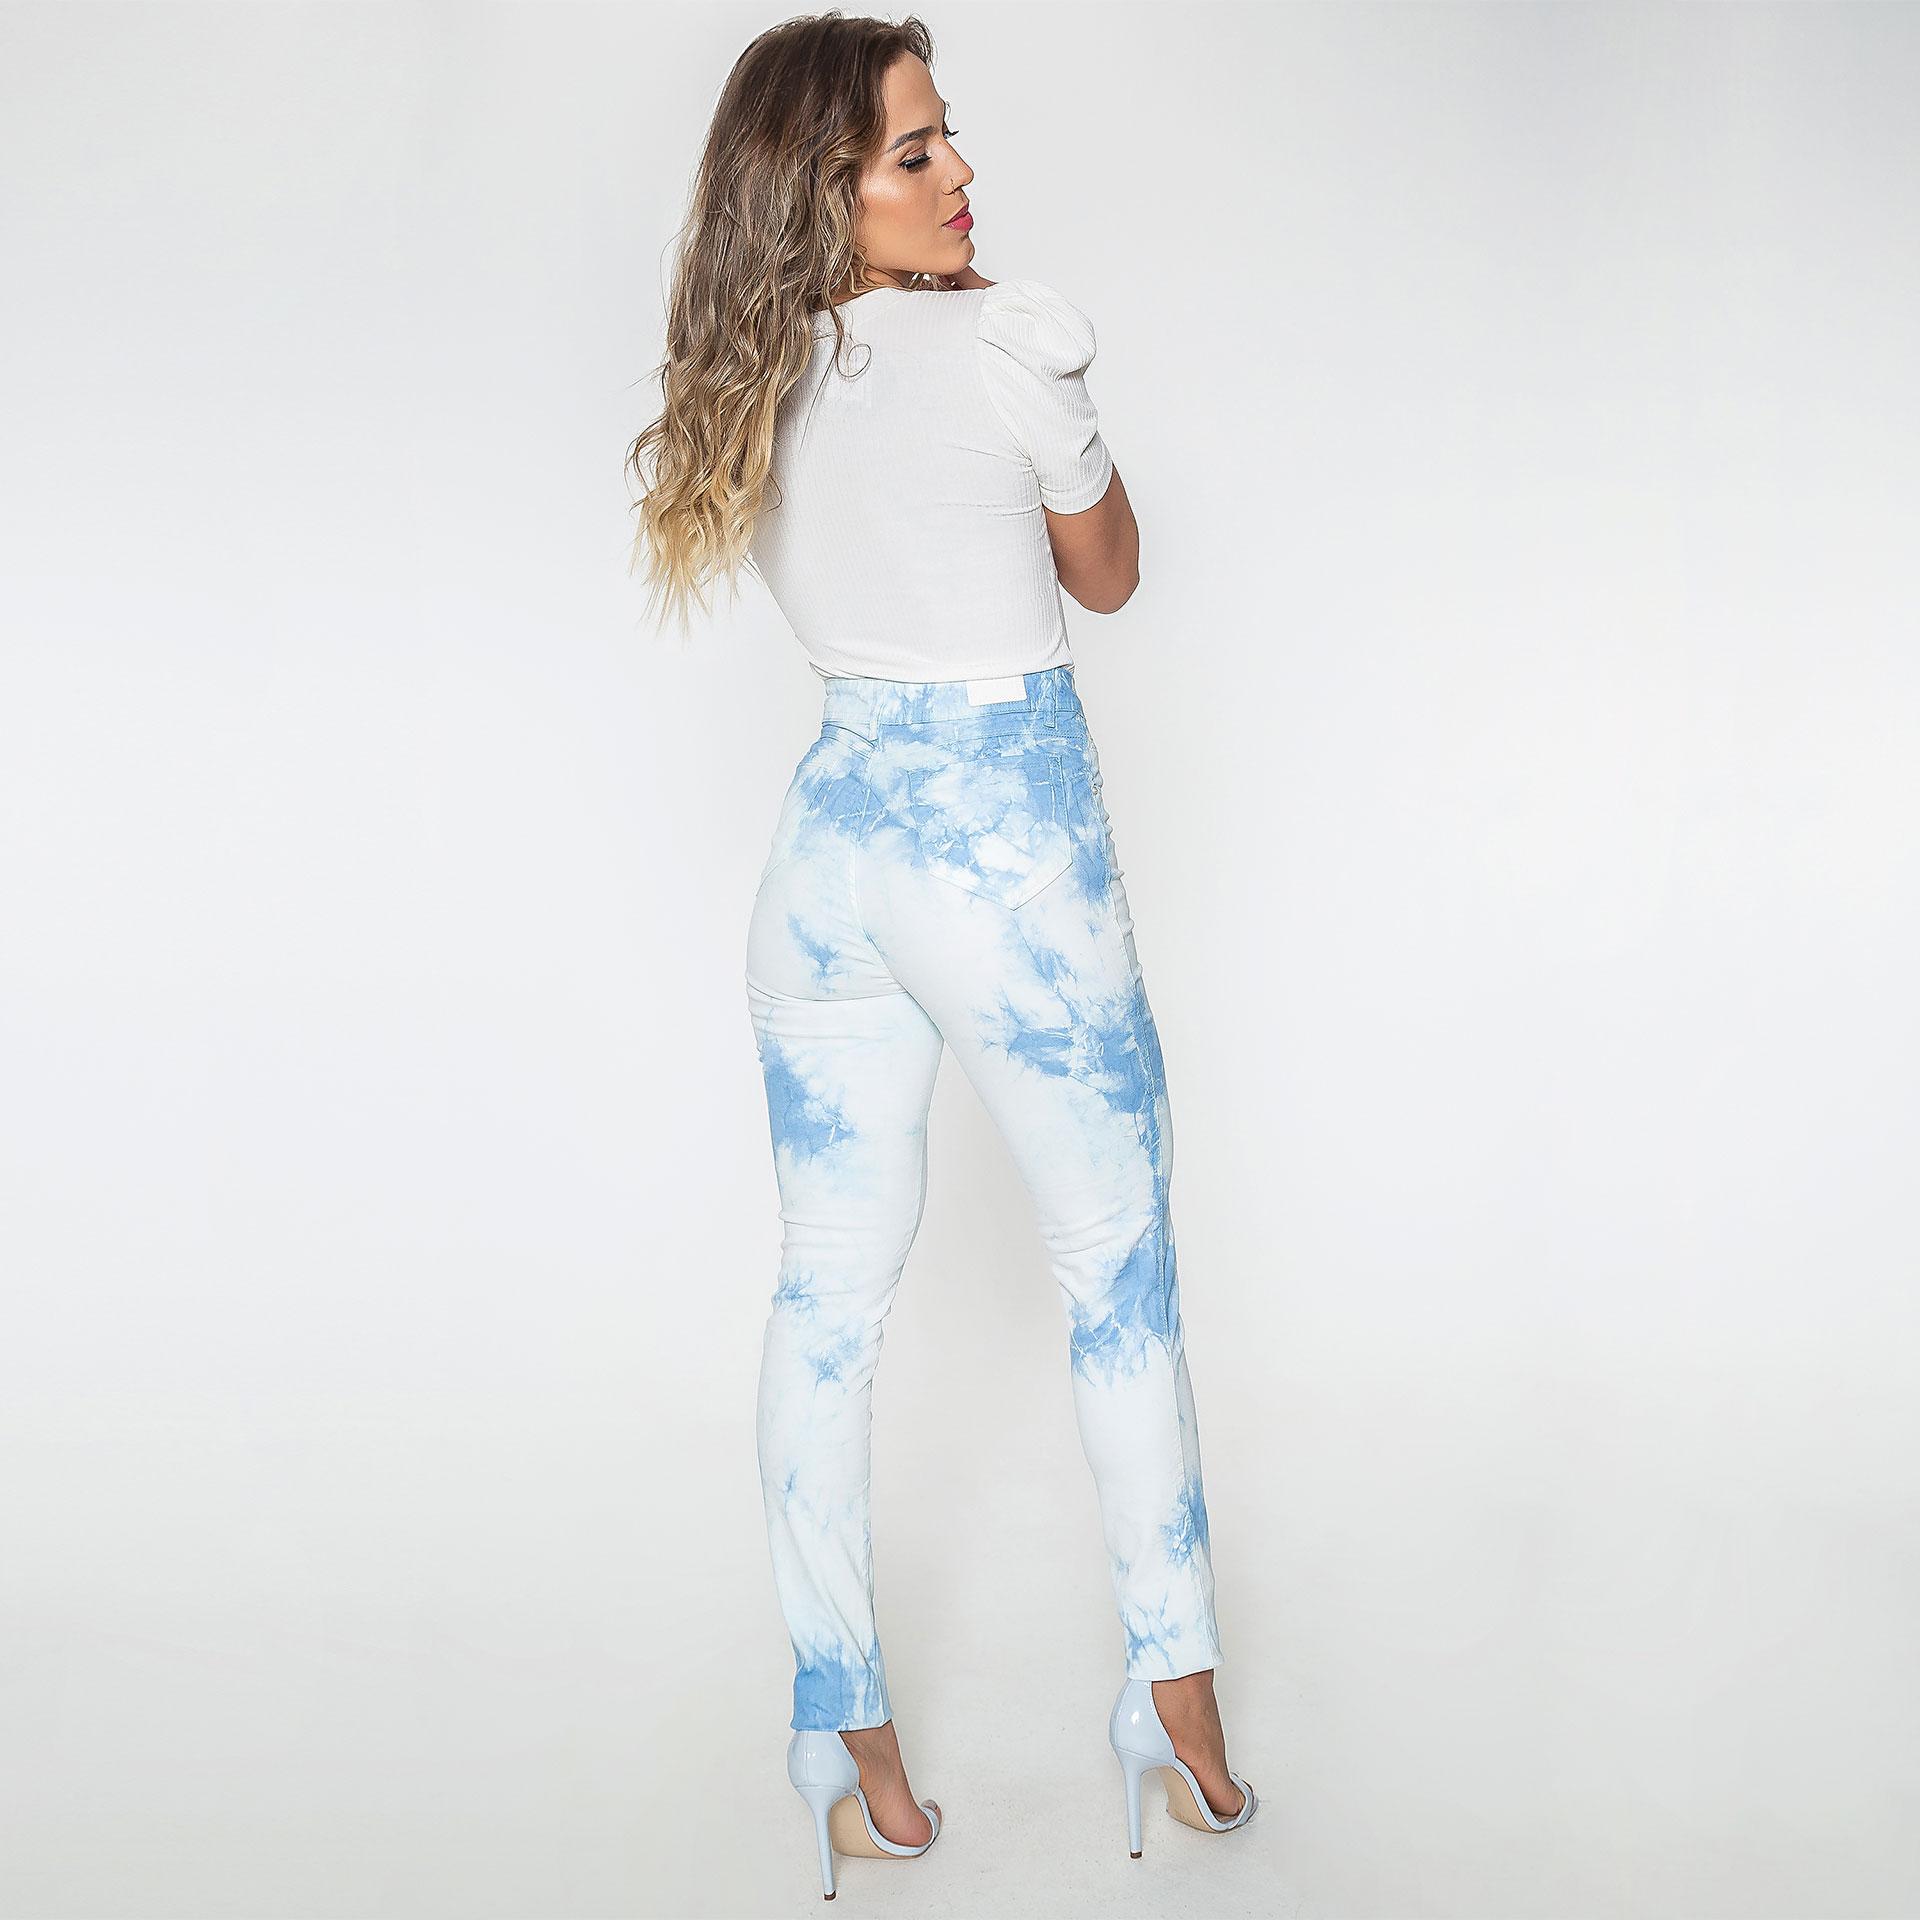 Calça Jeans Tie Dye